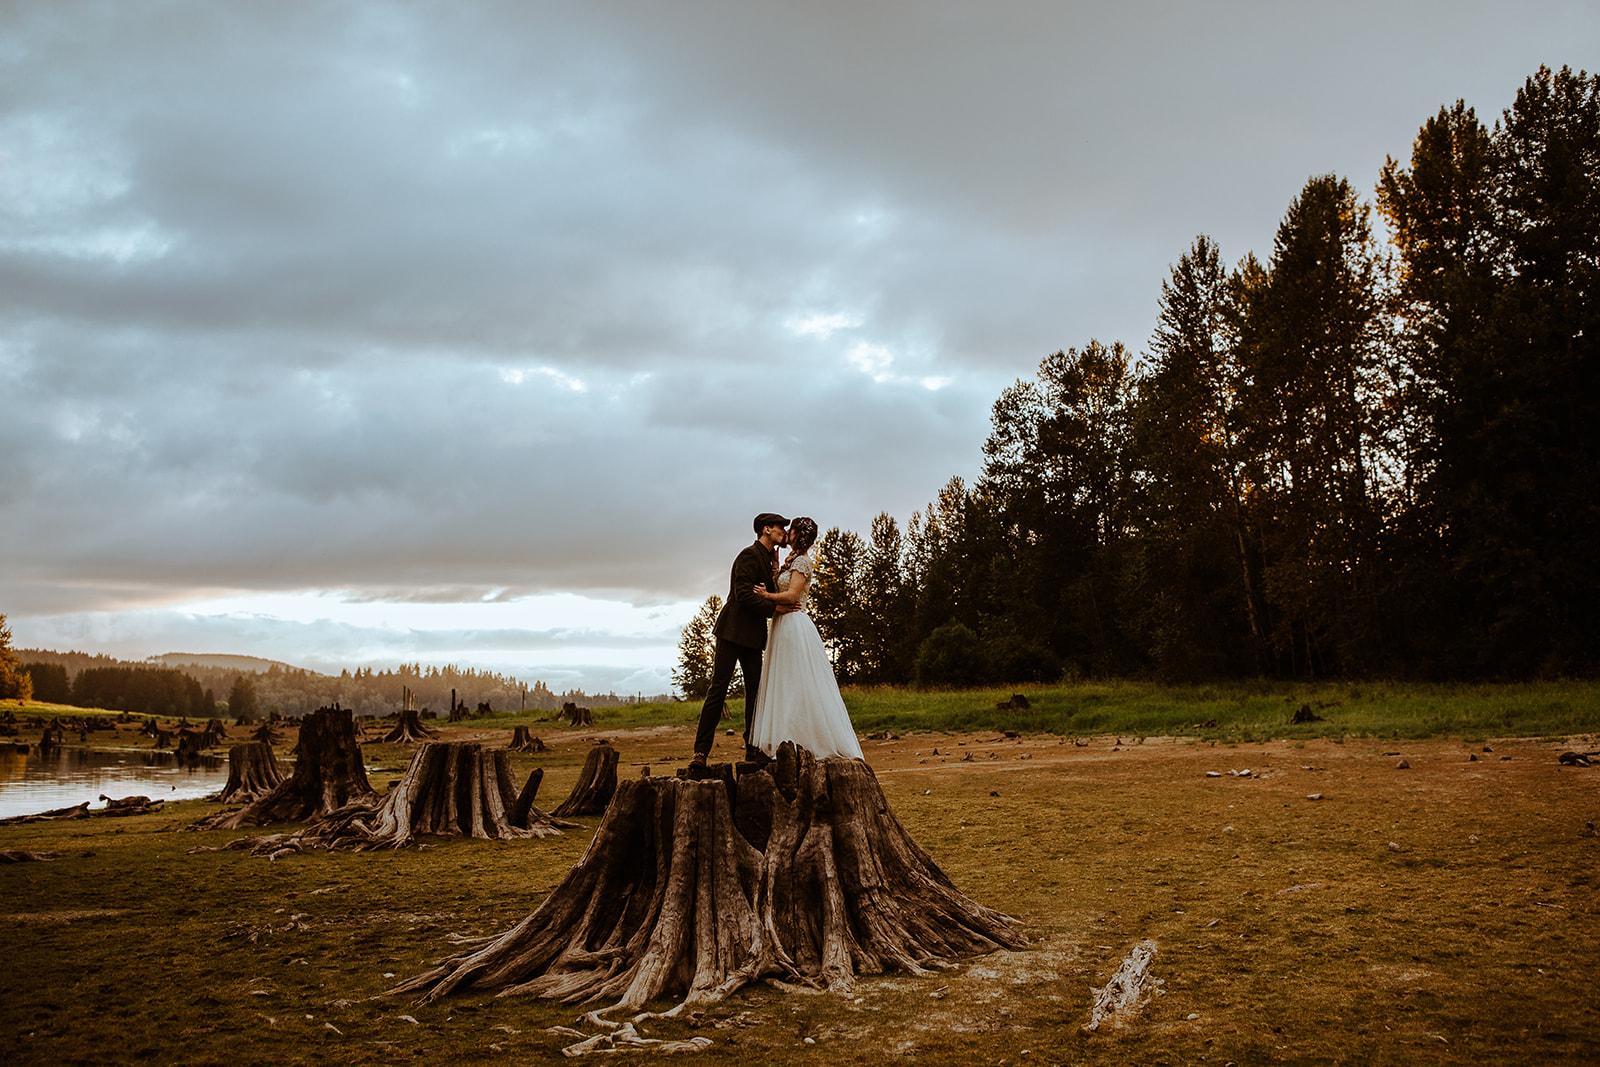 mount-rainier-cabin-elopement-megan-gallagher-photography_(483_of_568).jpg